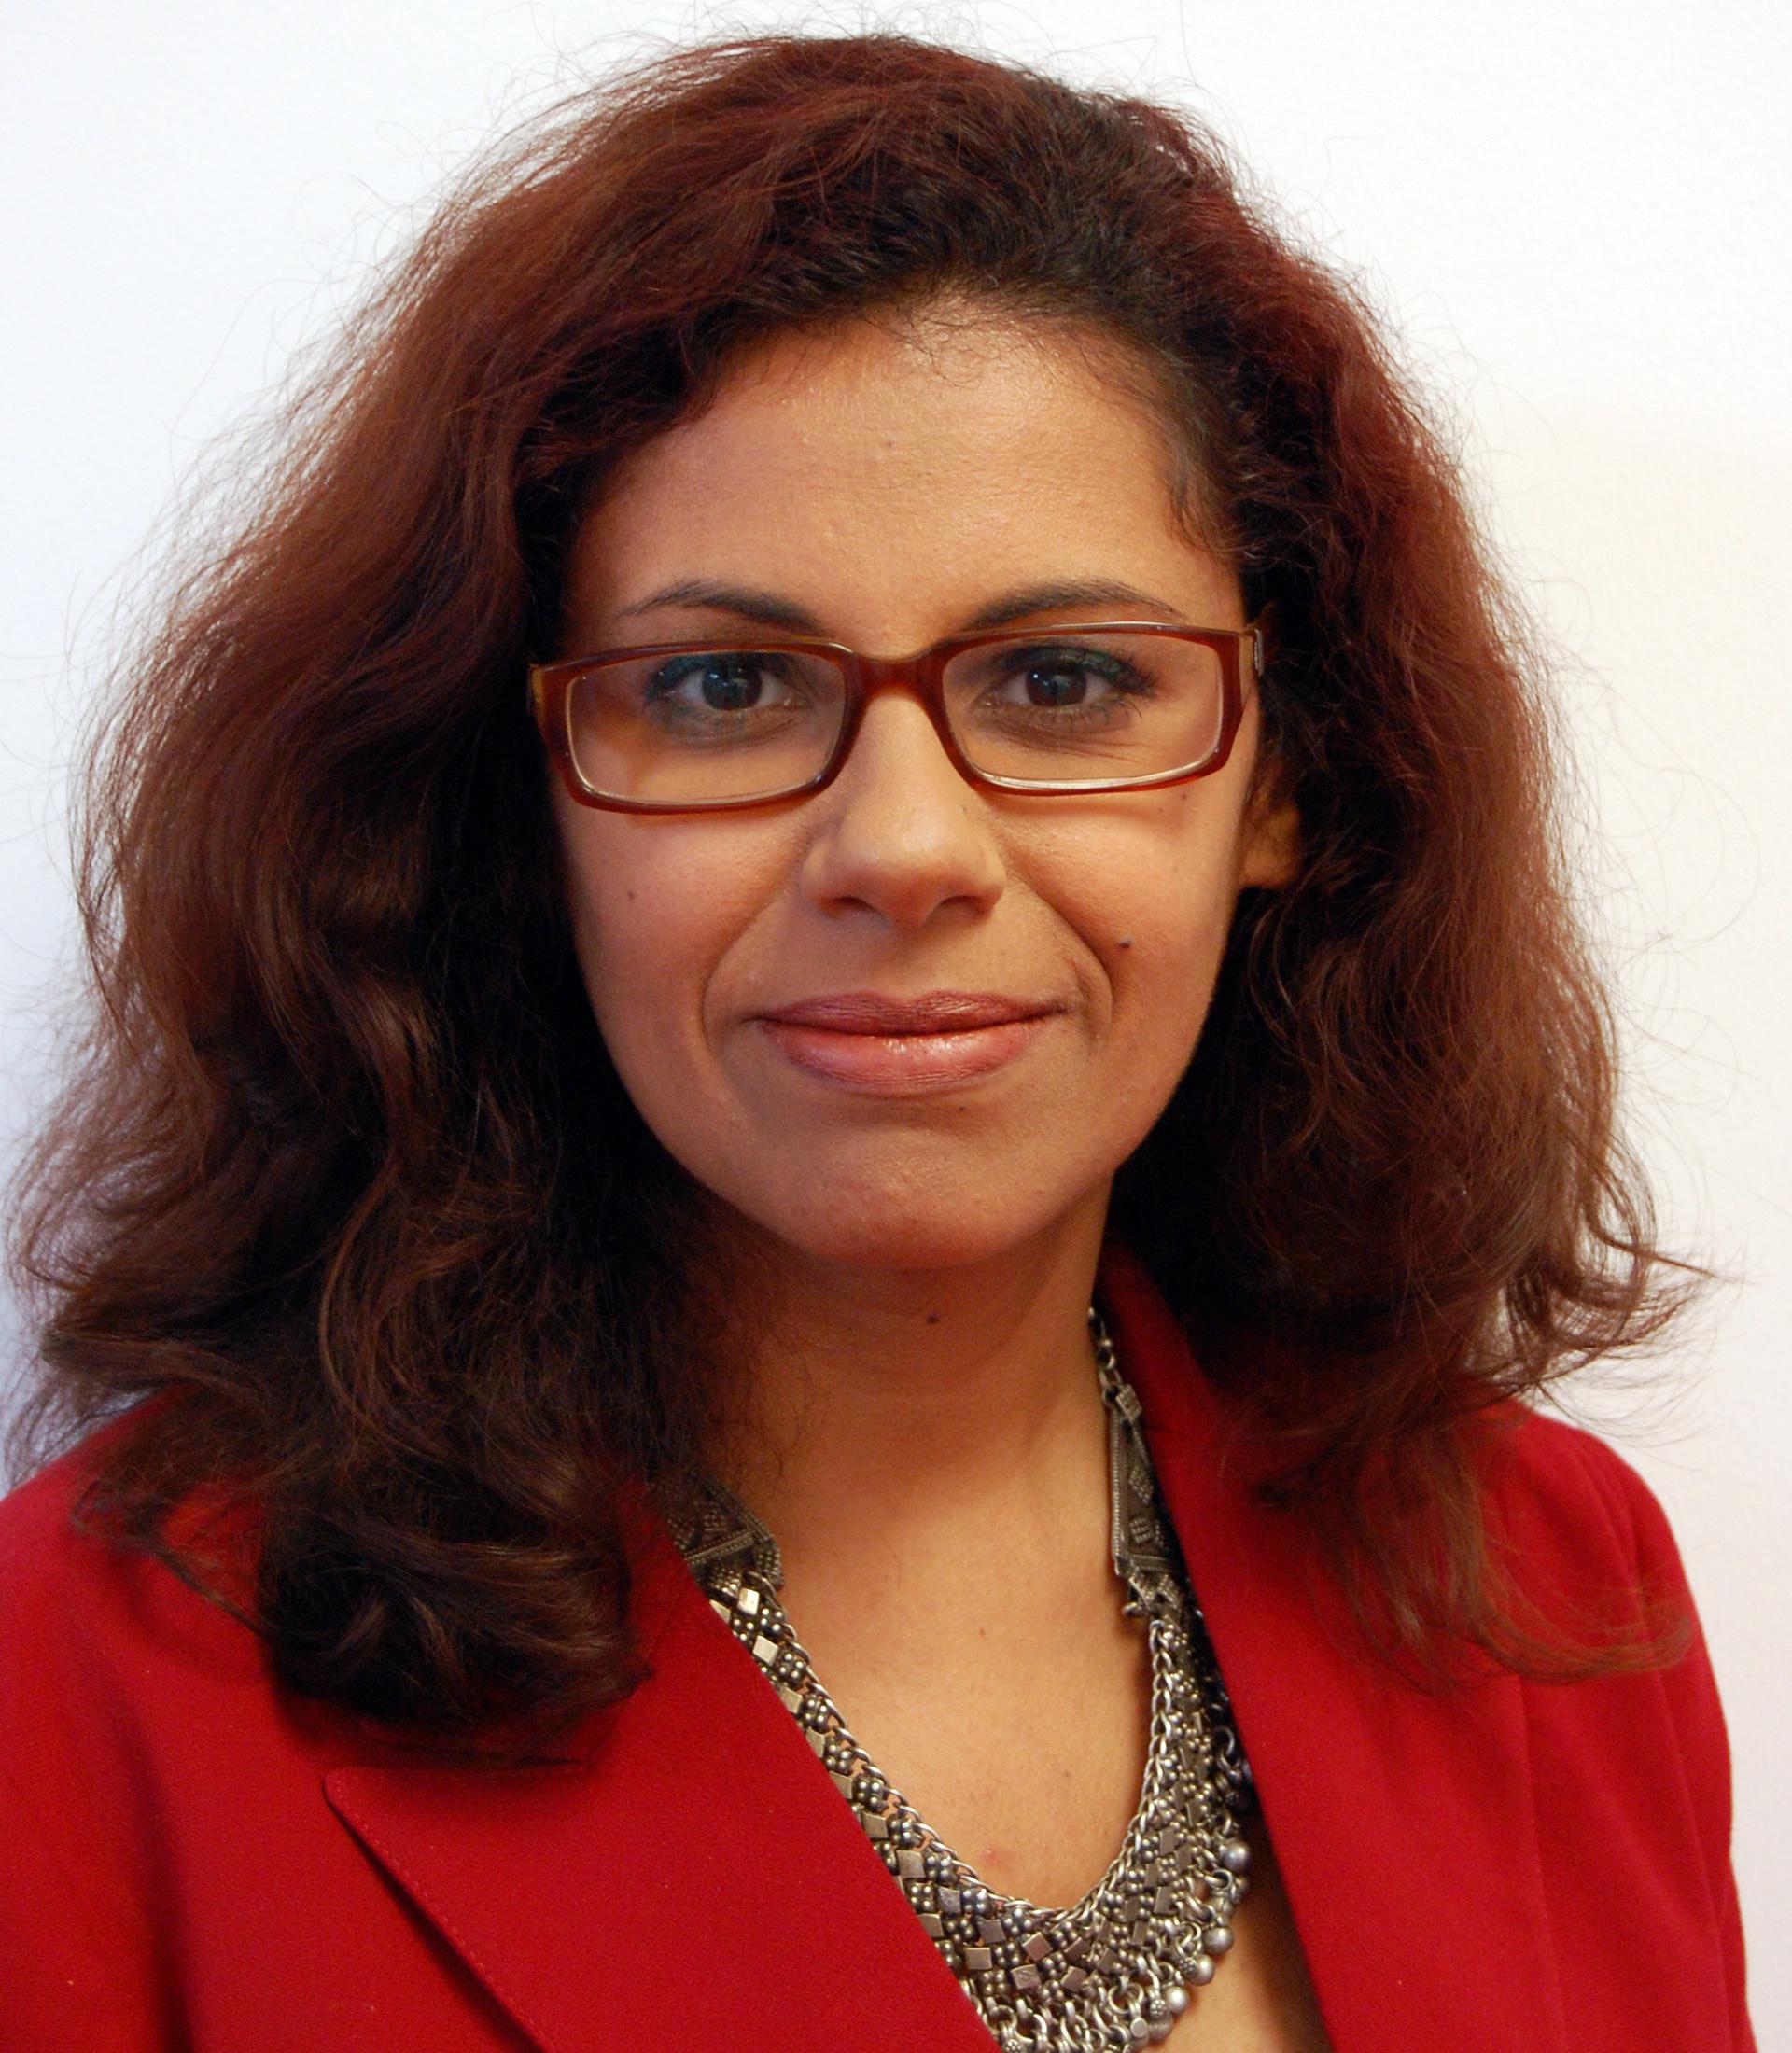 Mme Mariz Tadros